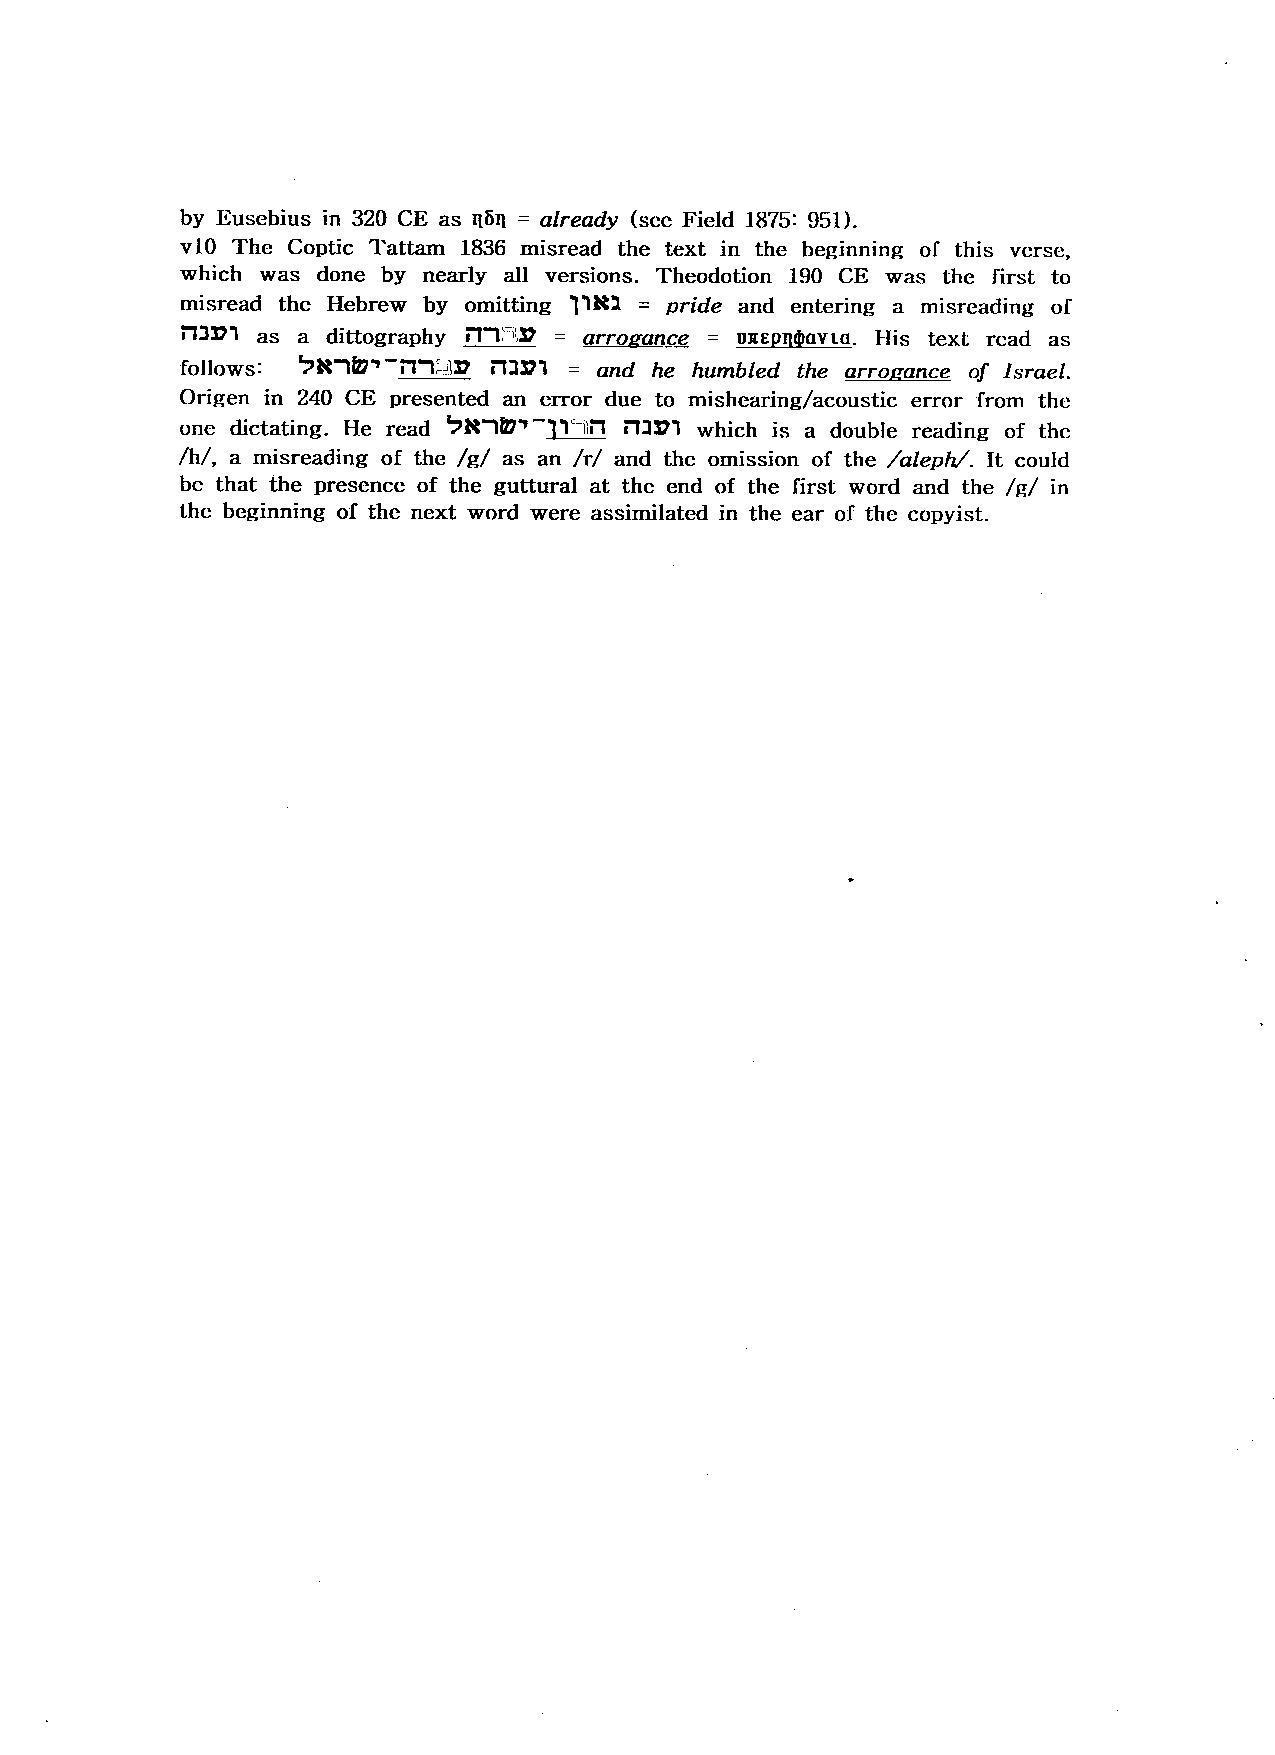 coptic of hosea in english 7g.jpg